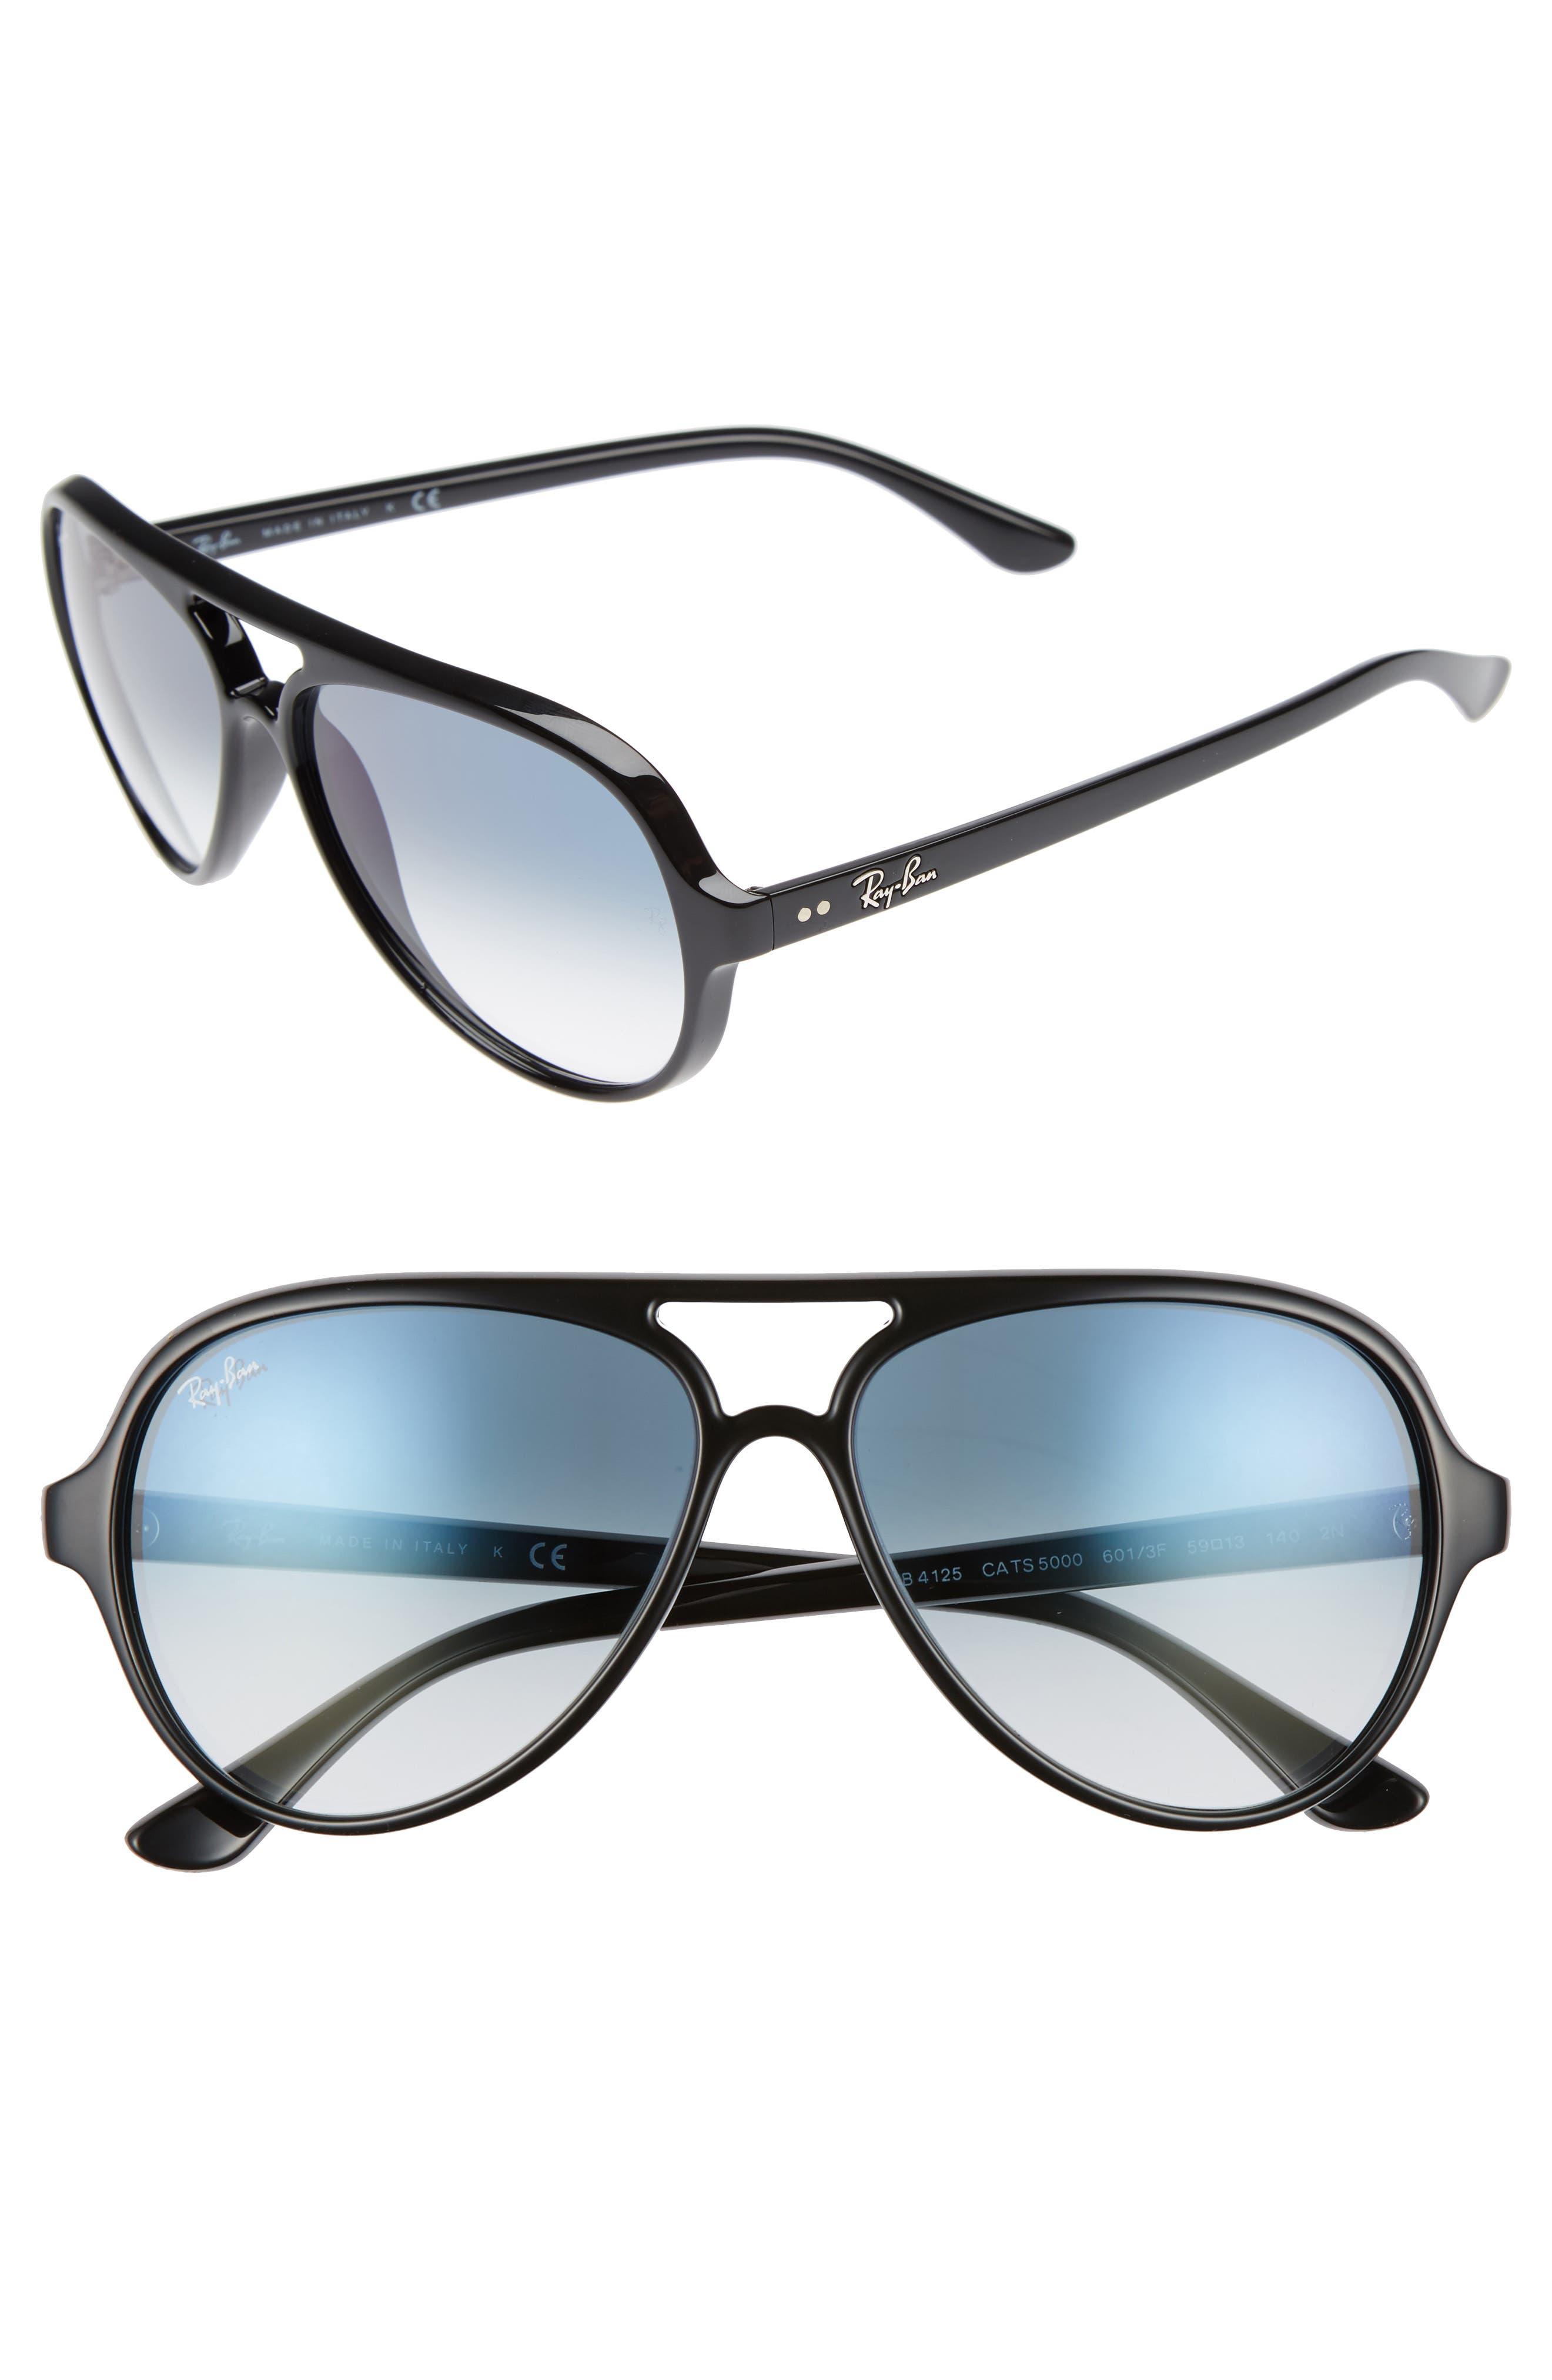 Main Image - Ray-Ban 59mm Resin Aviator Sunglasses